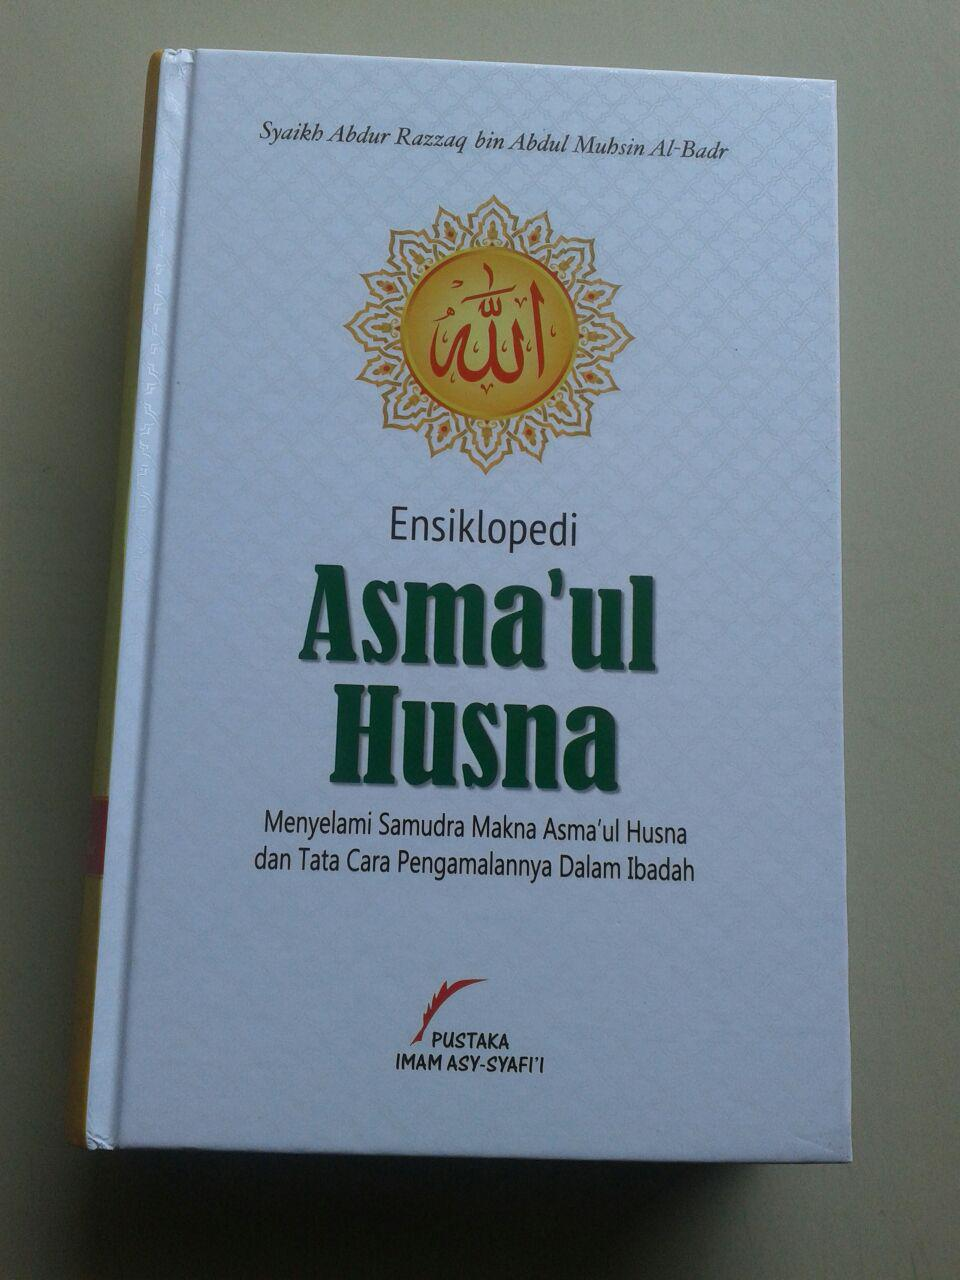 Buku Ensiklopedi Asma'ul Husna Menyelami Makna Tata Cara Pengamalannya cover 2